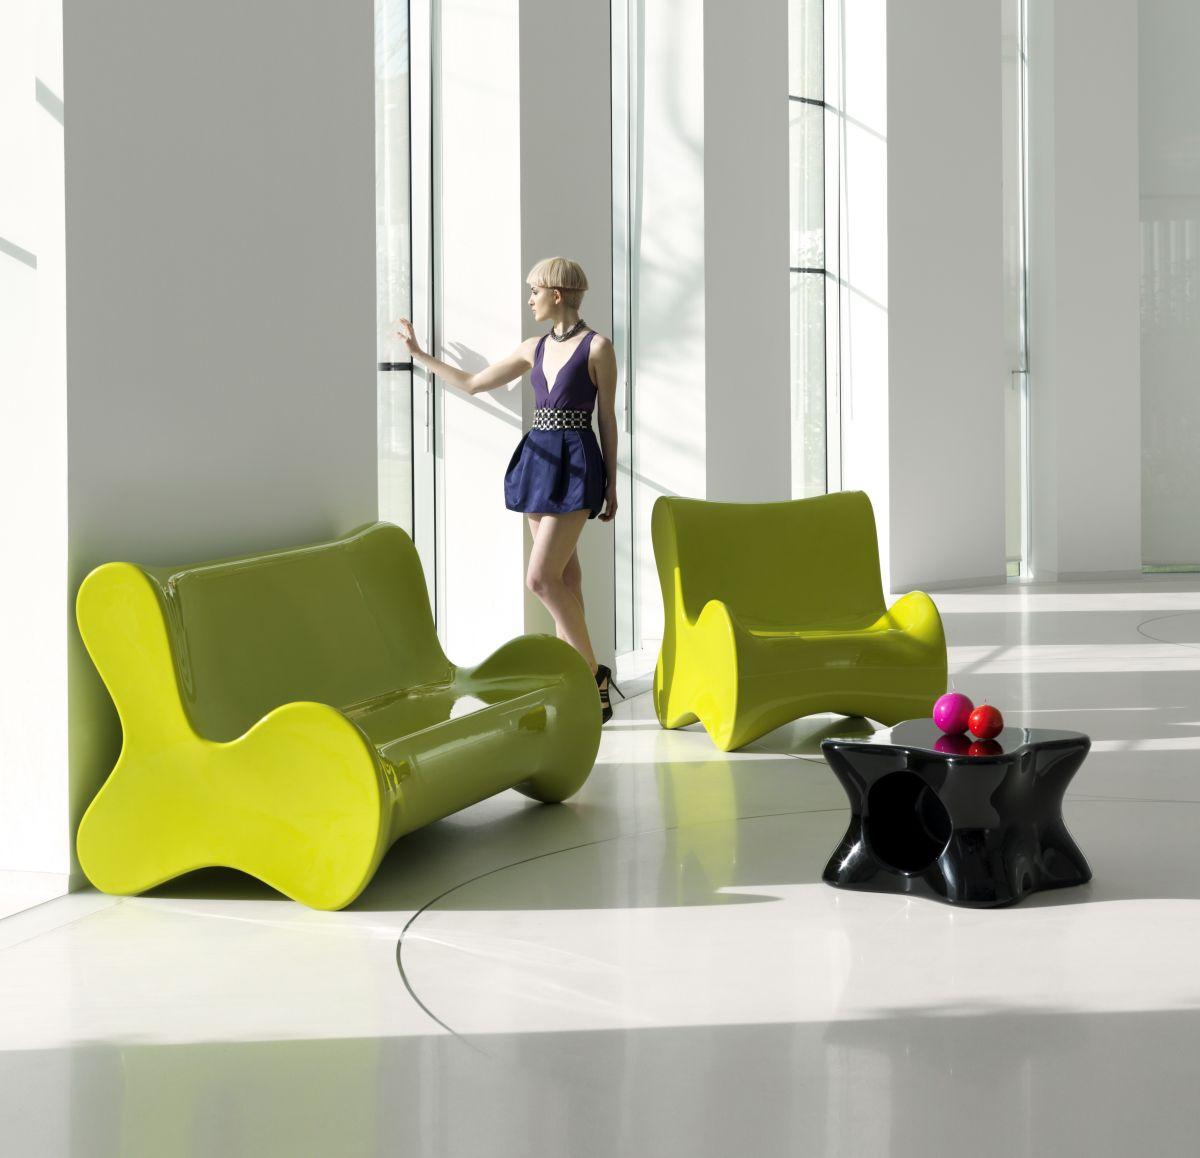 karim rashid furniture-ის სურათის შედეგი